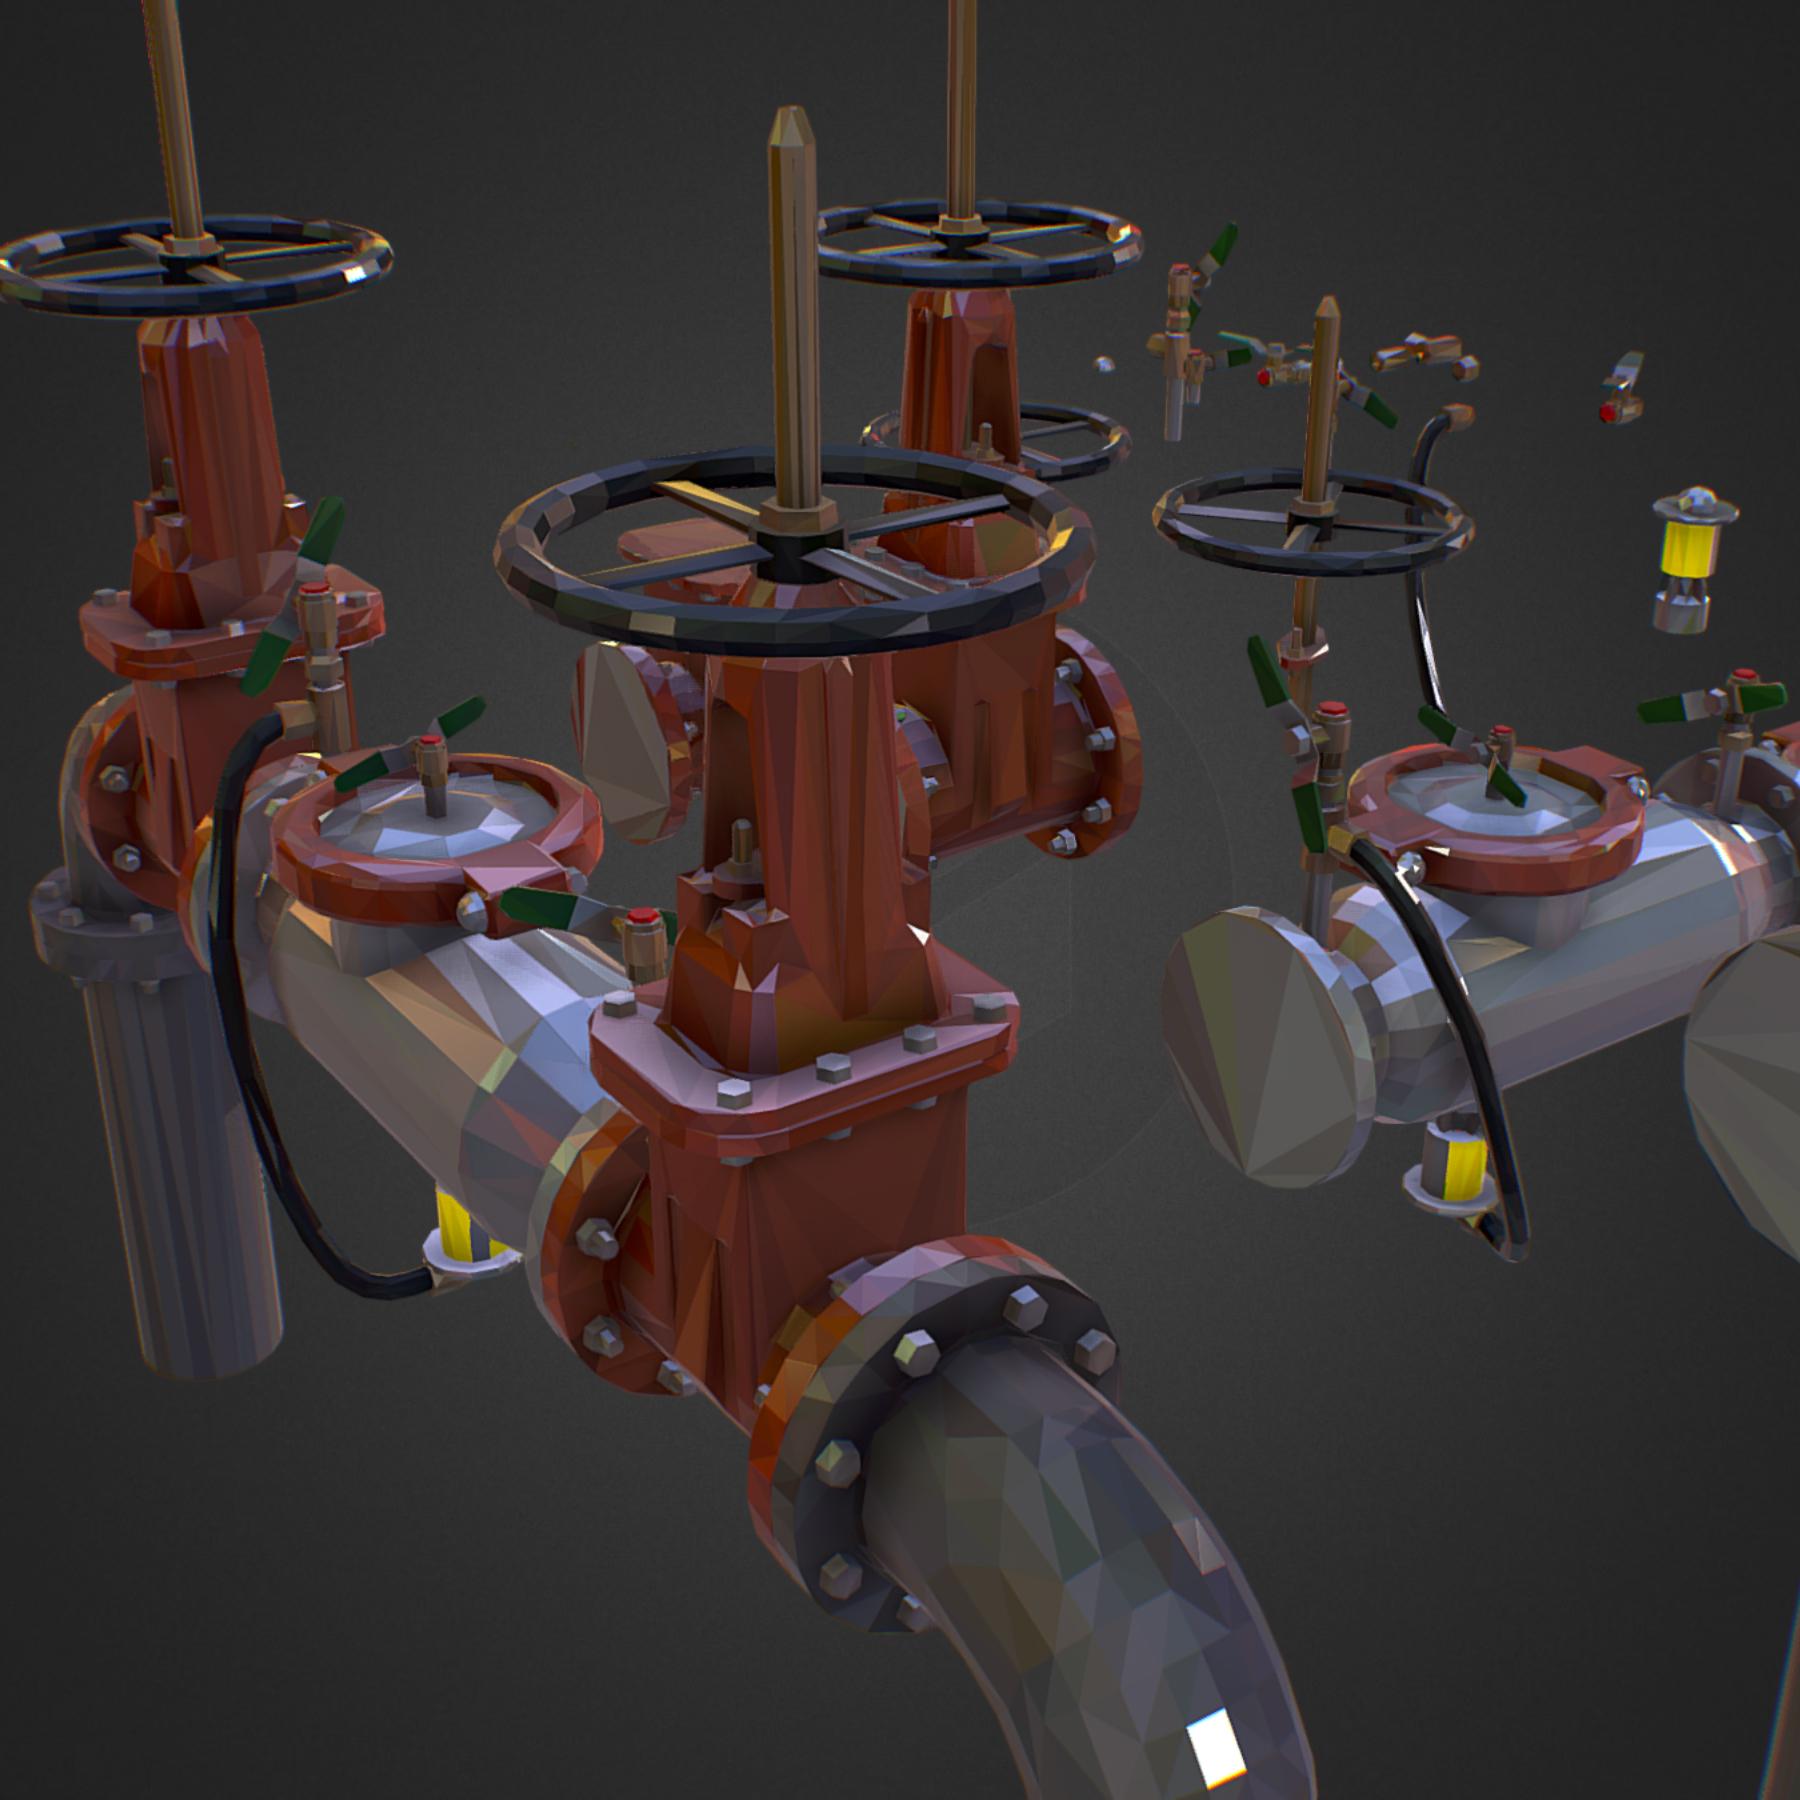 Low Poly ART Backflow Water Pipe Constructor 3d model max 3ds max plugin fbx ma mb tga targa icb vda vst pix obj 272537